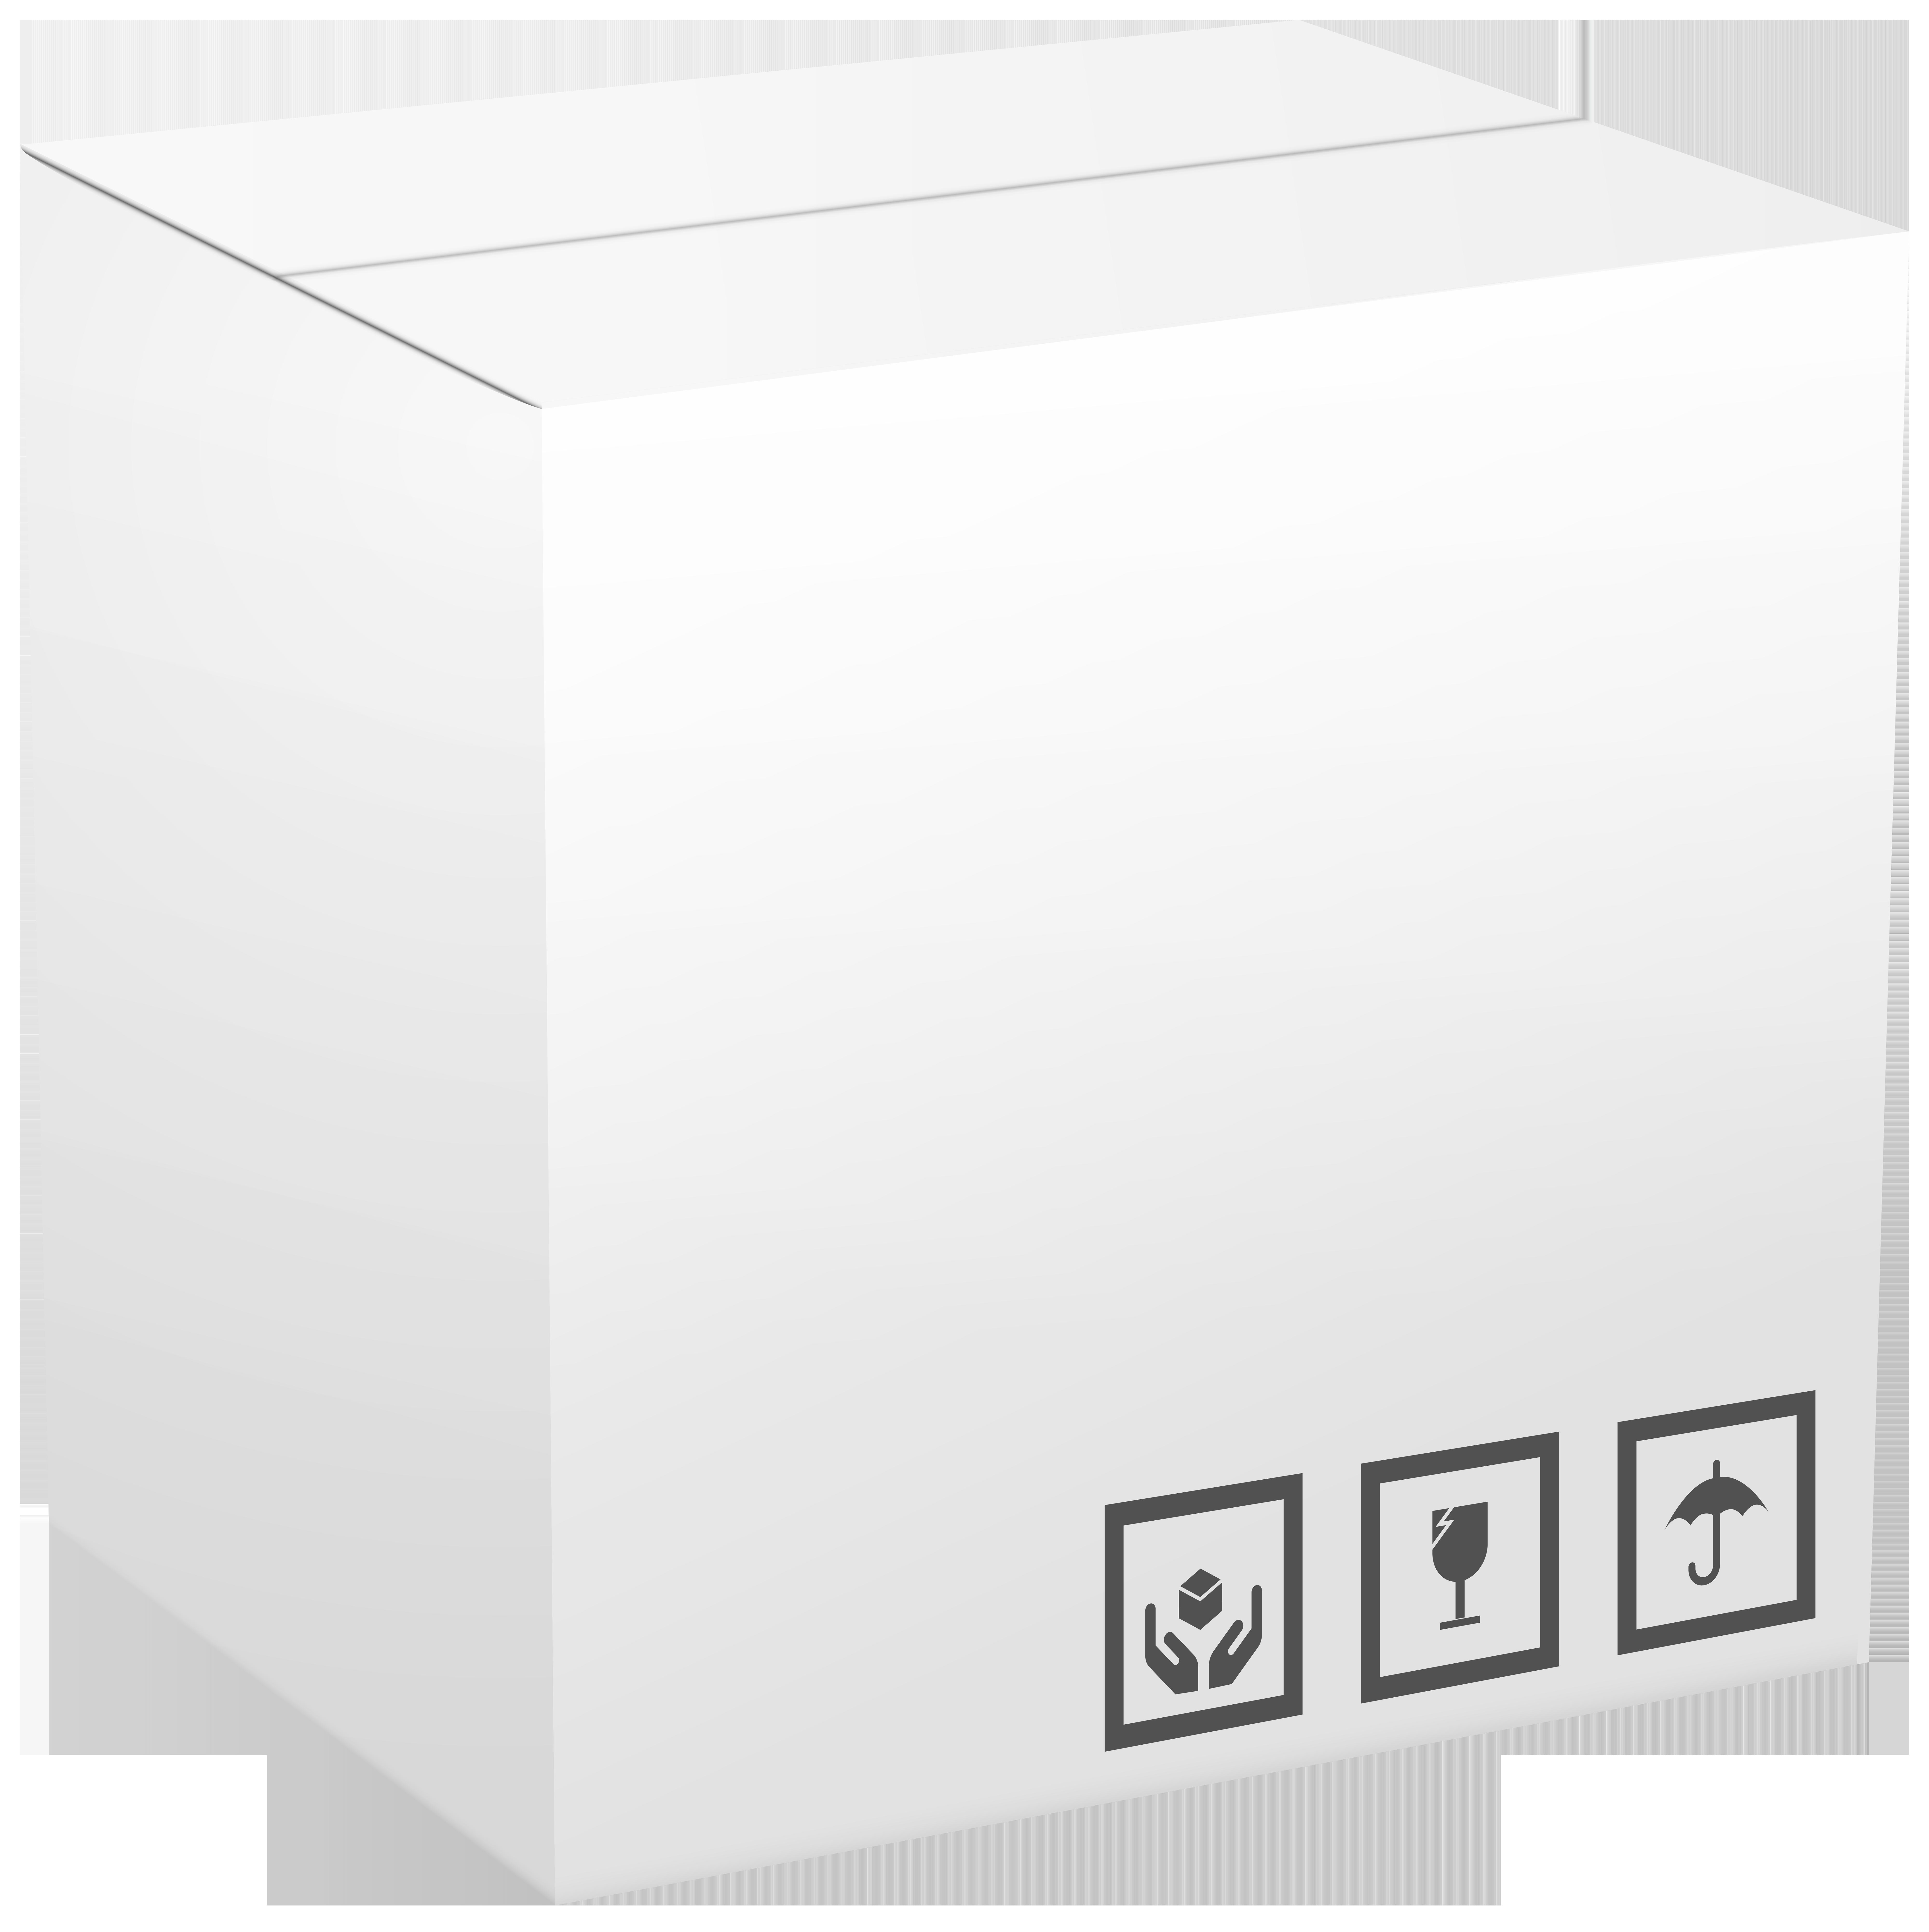 White cardboard png clip. Clipart box carton box